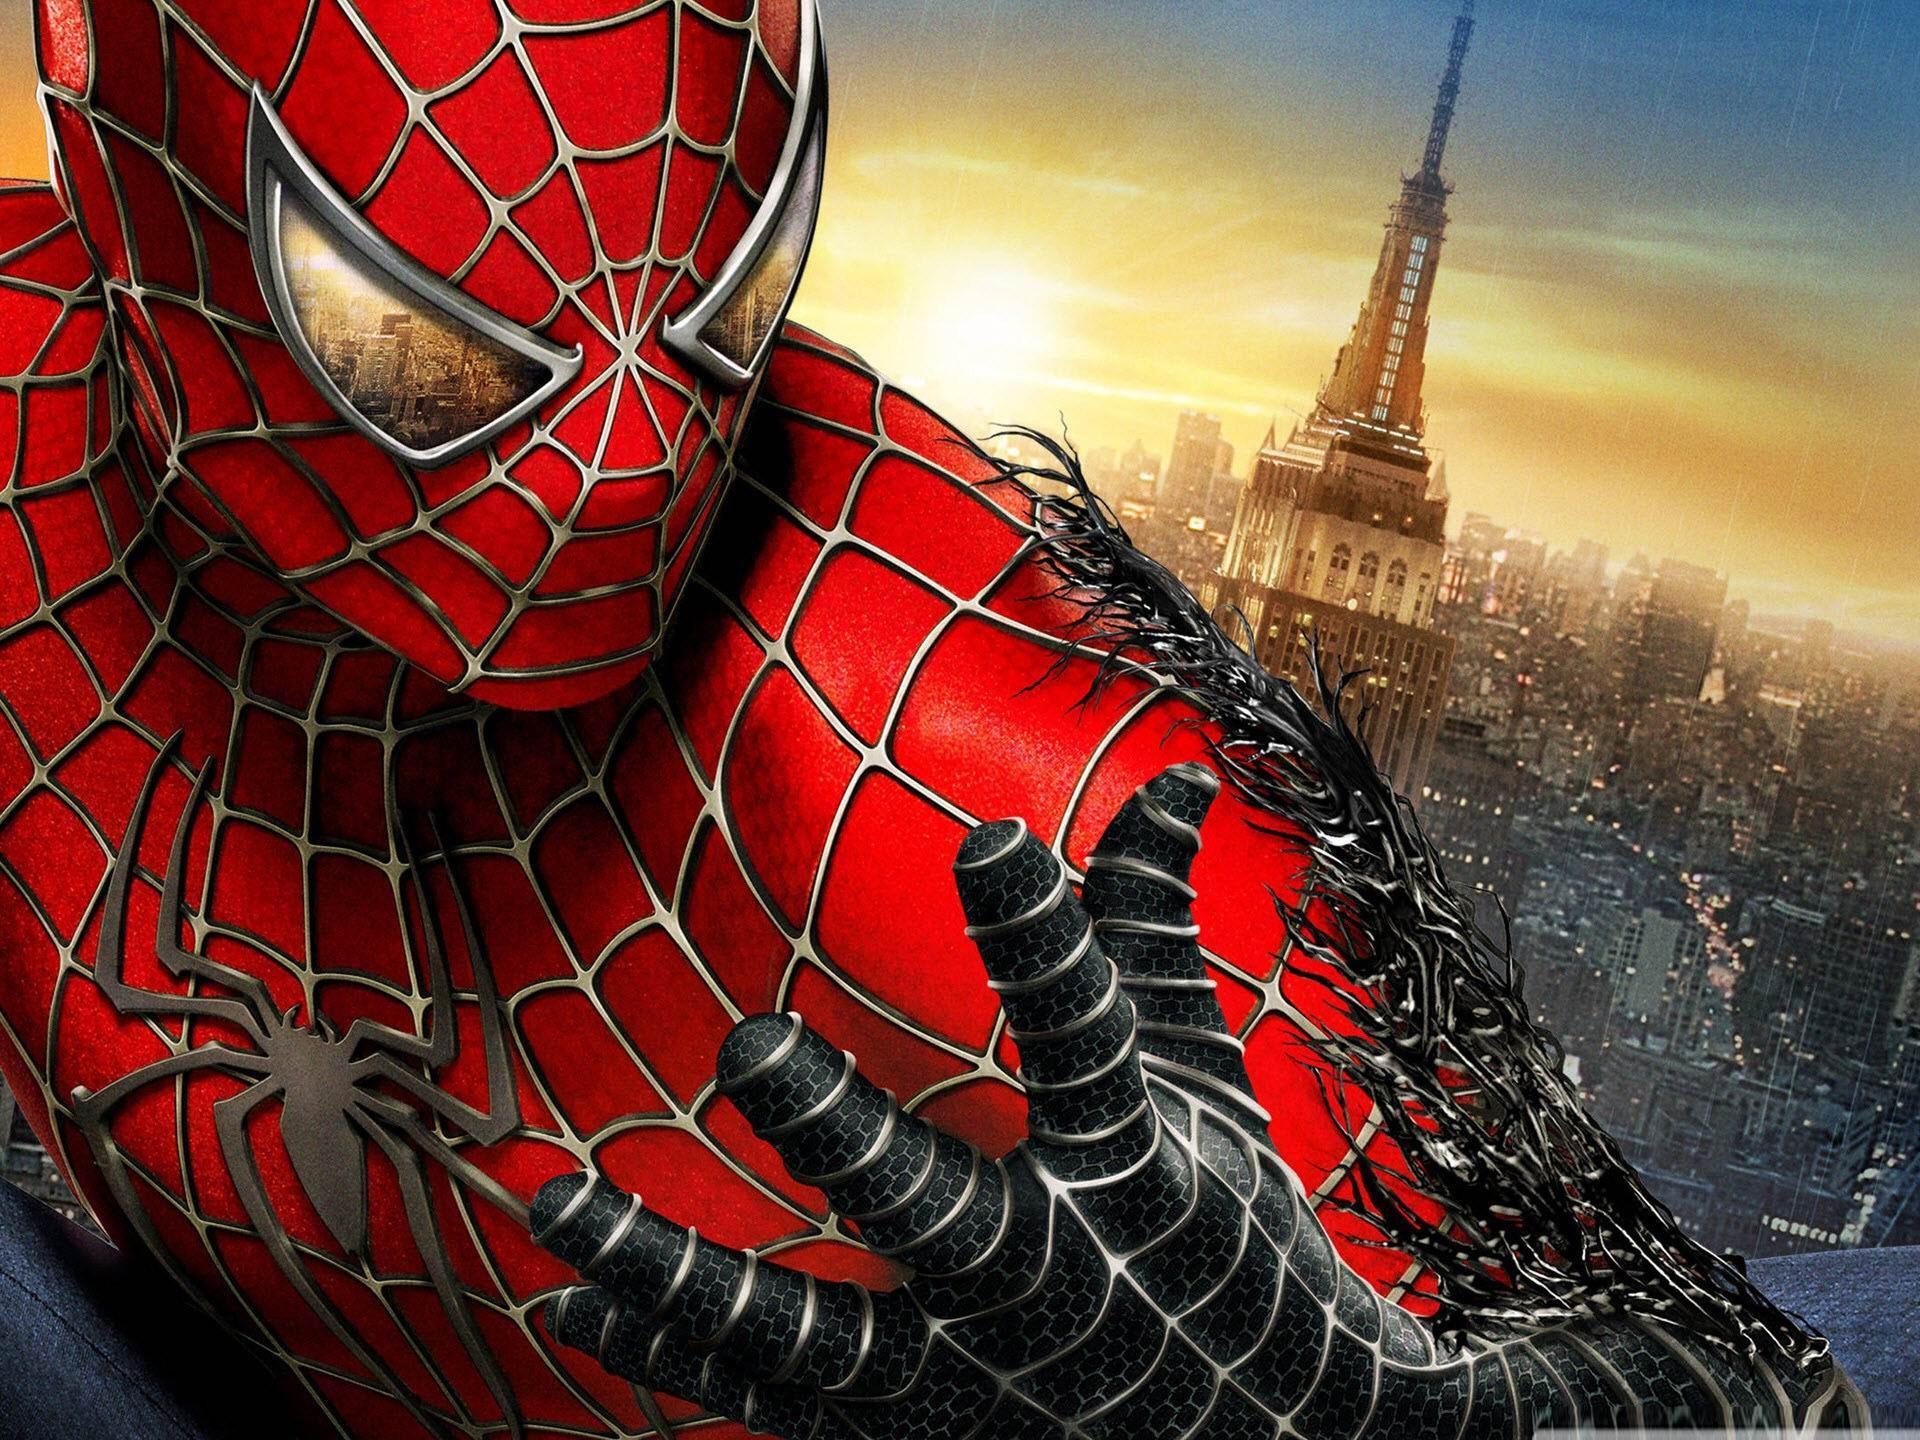 The Amazing Spider Man 2012 HD Movie Wallpaper 05-1920x1440 Download   10wallpaper.com